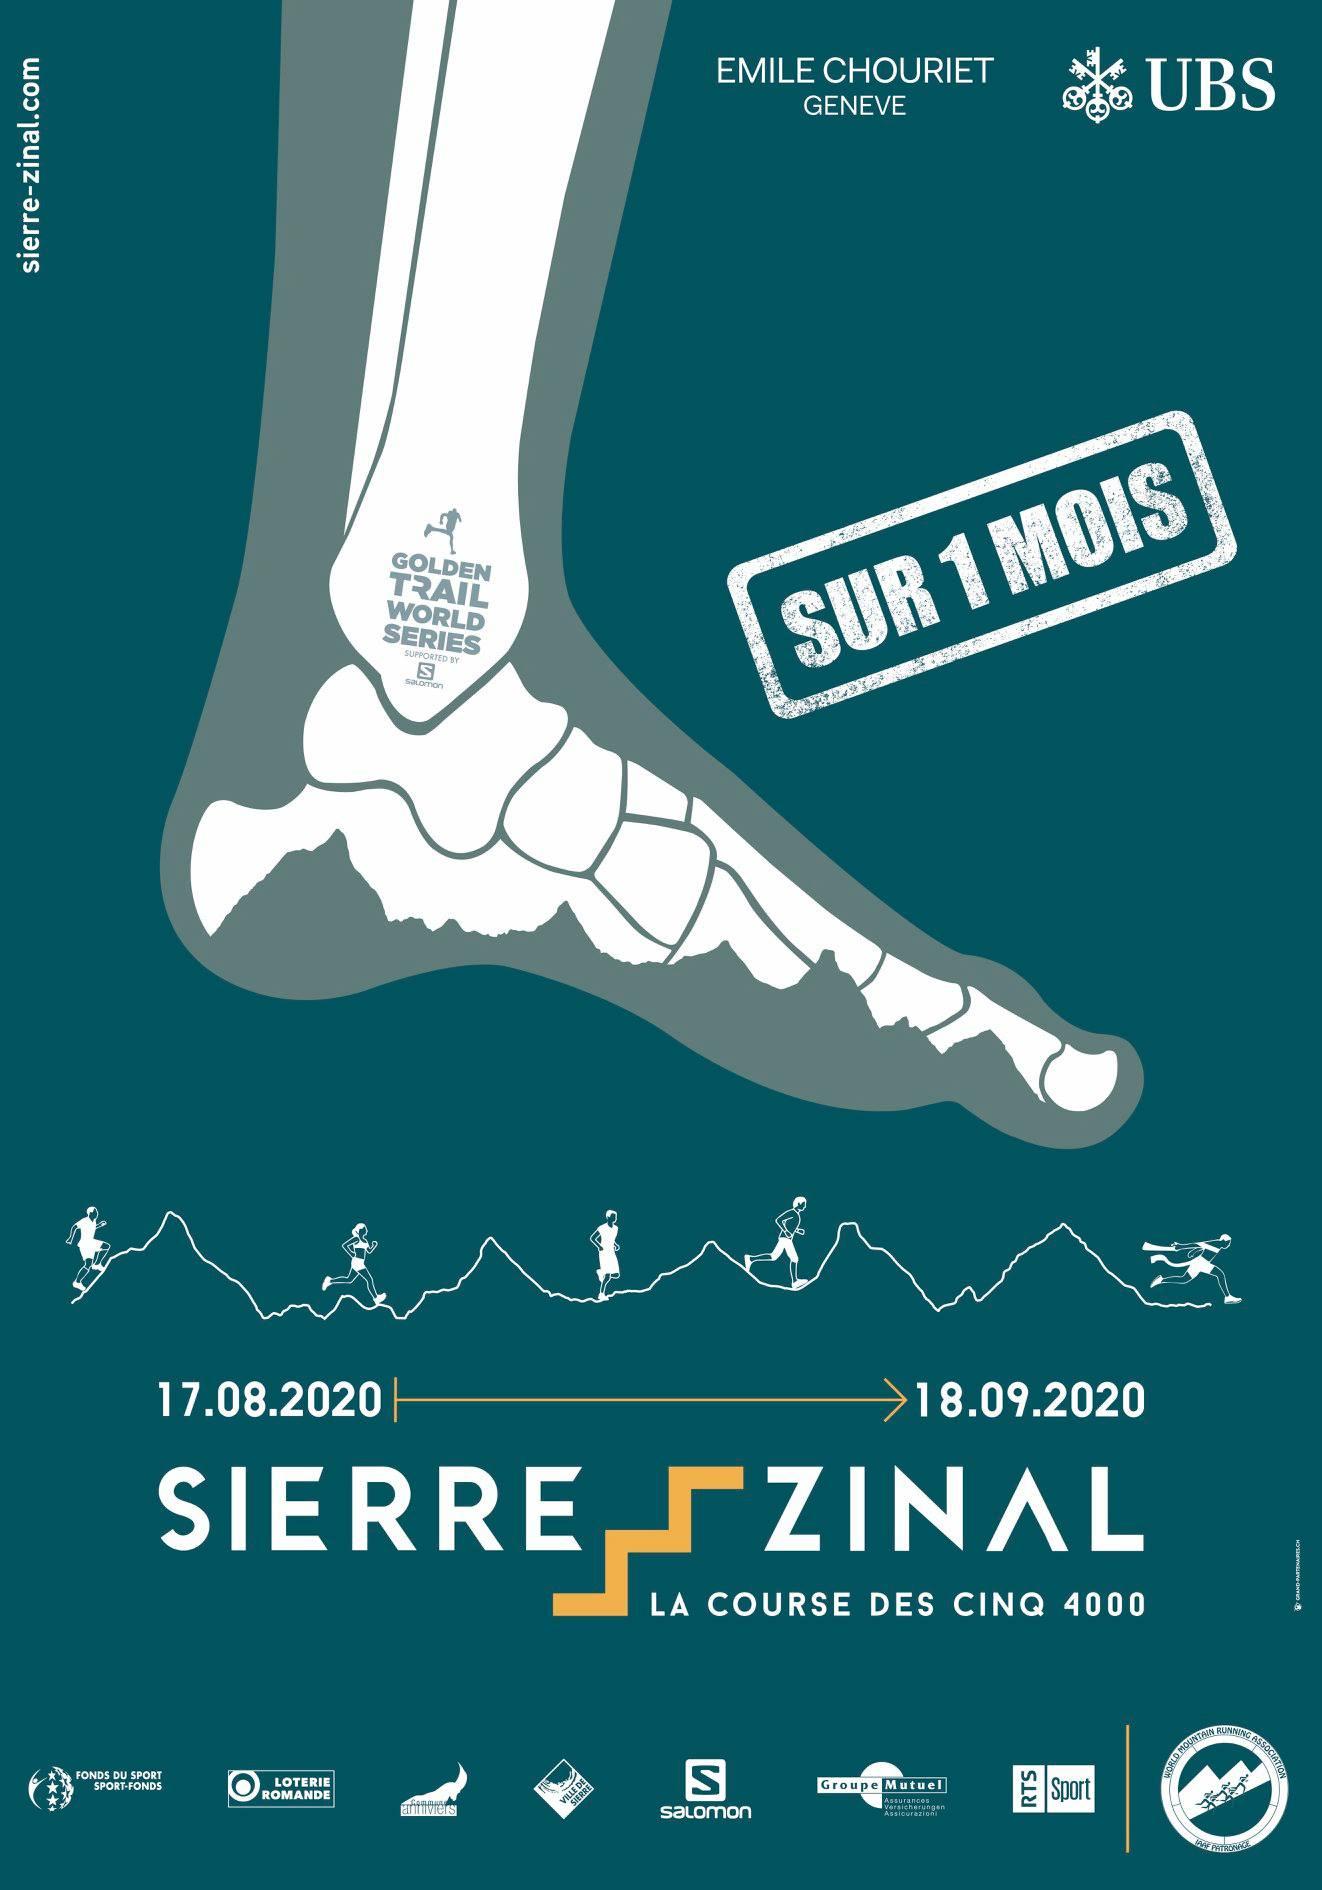 Affiche-Sierre-Zinal-2020-1-mois